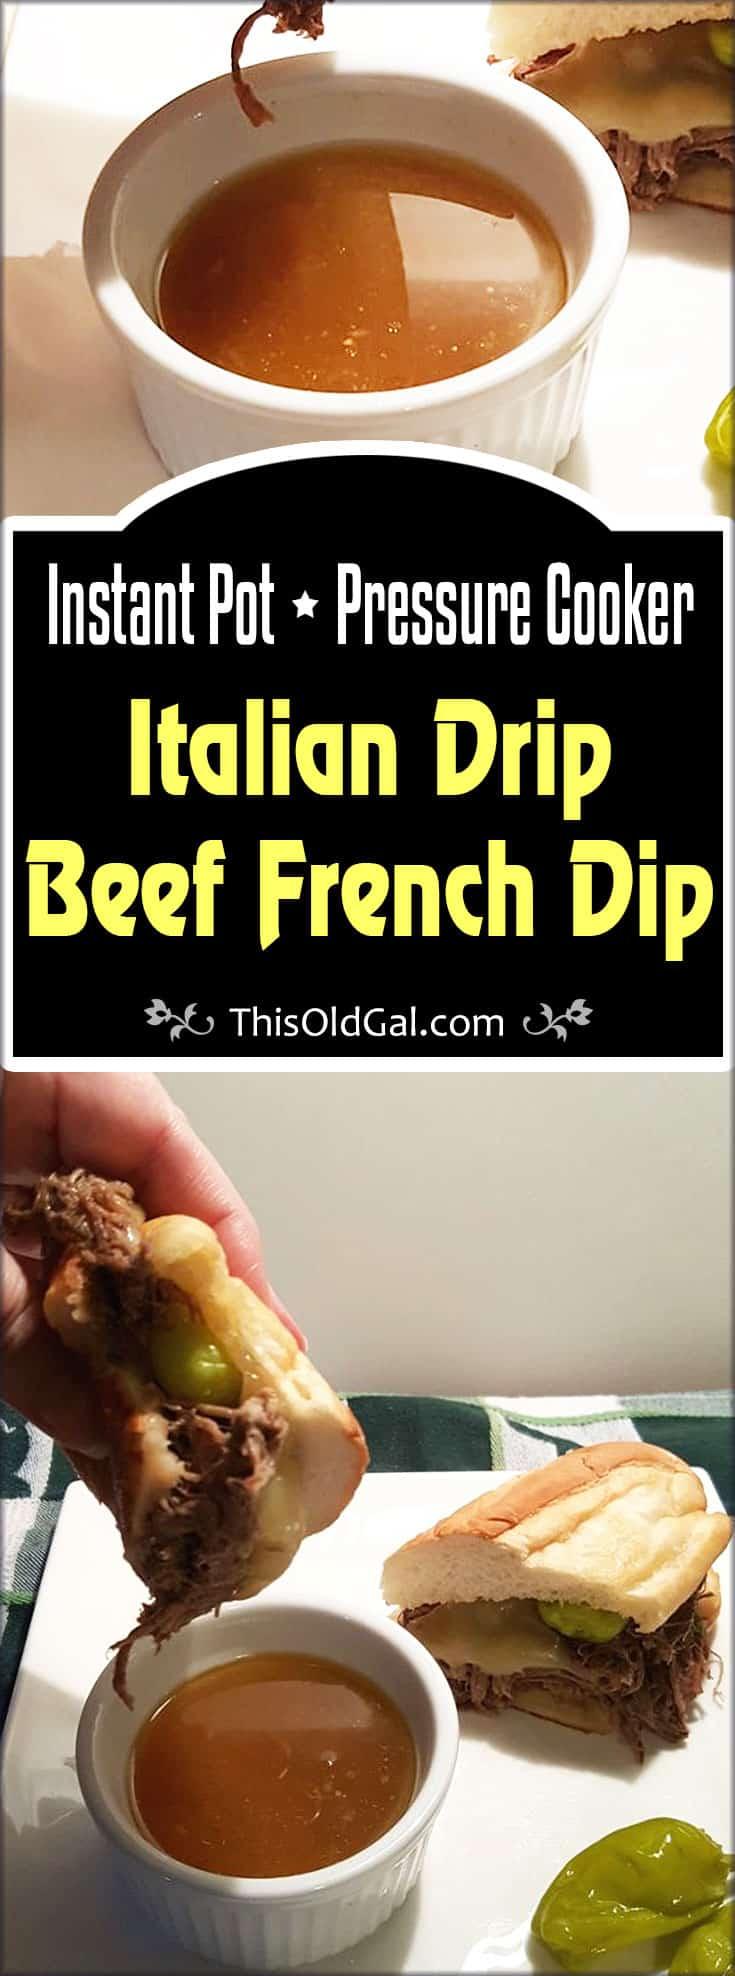 Pressure Cooker Italian Drip Beef French Dip